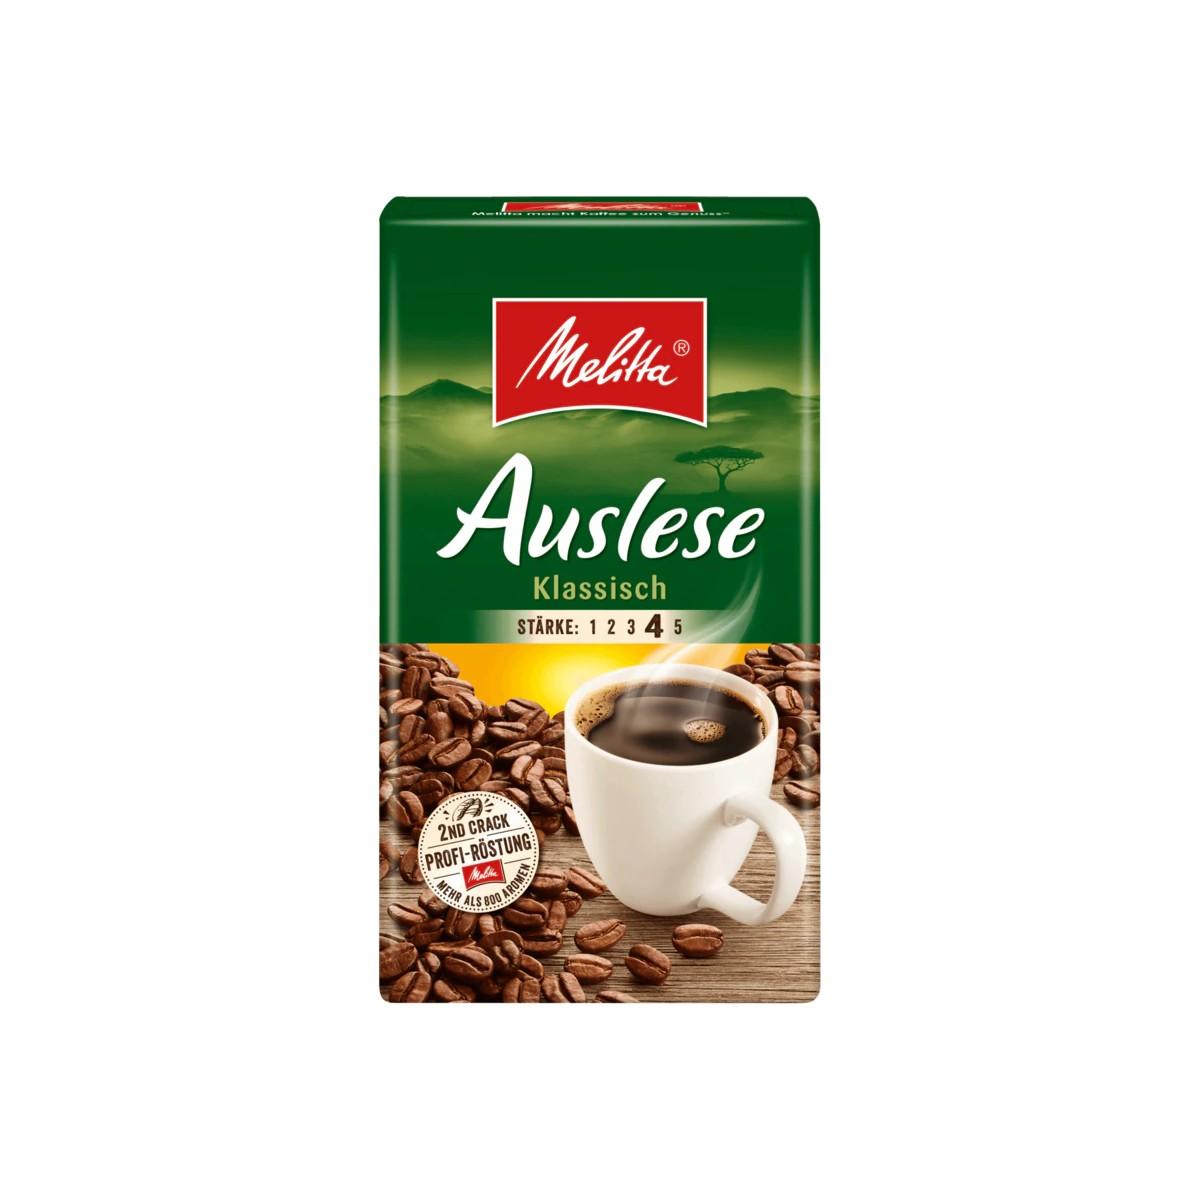 Melitta Auslese Röstkaffee Klassisch